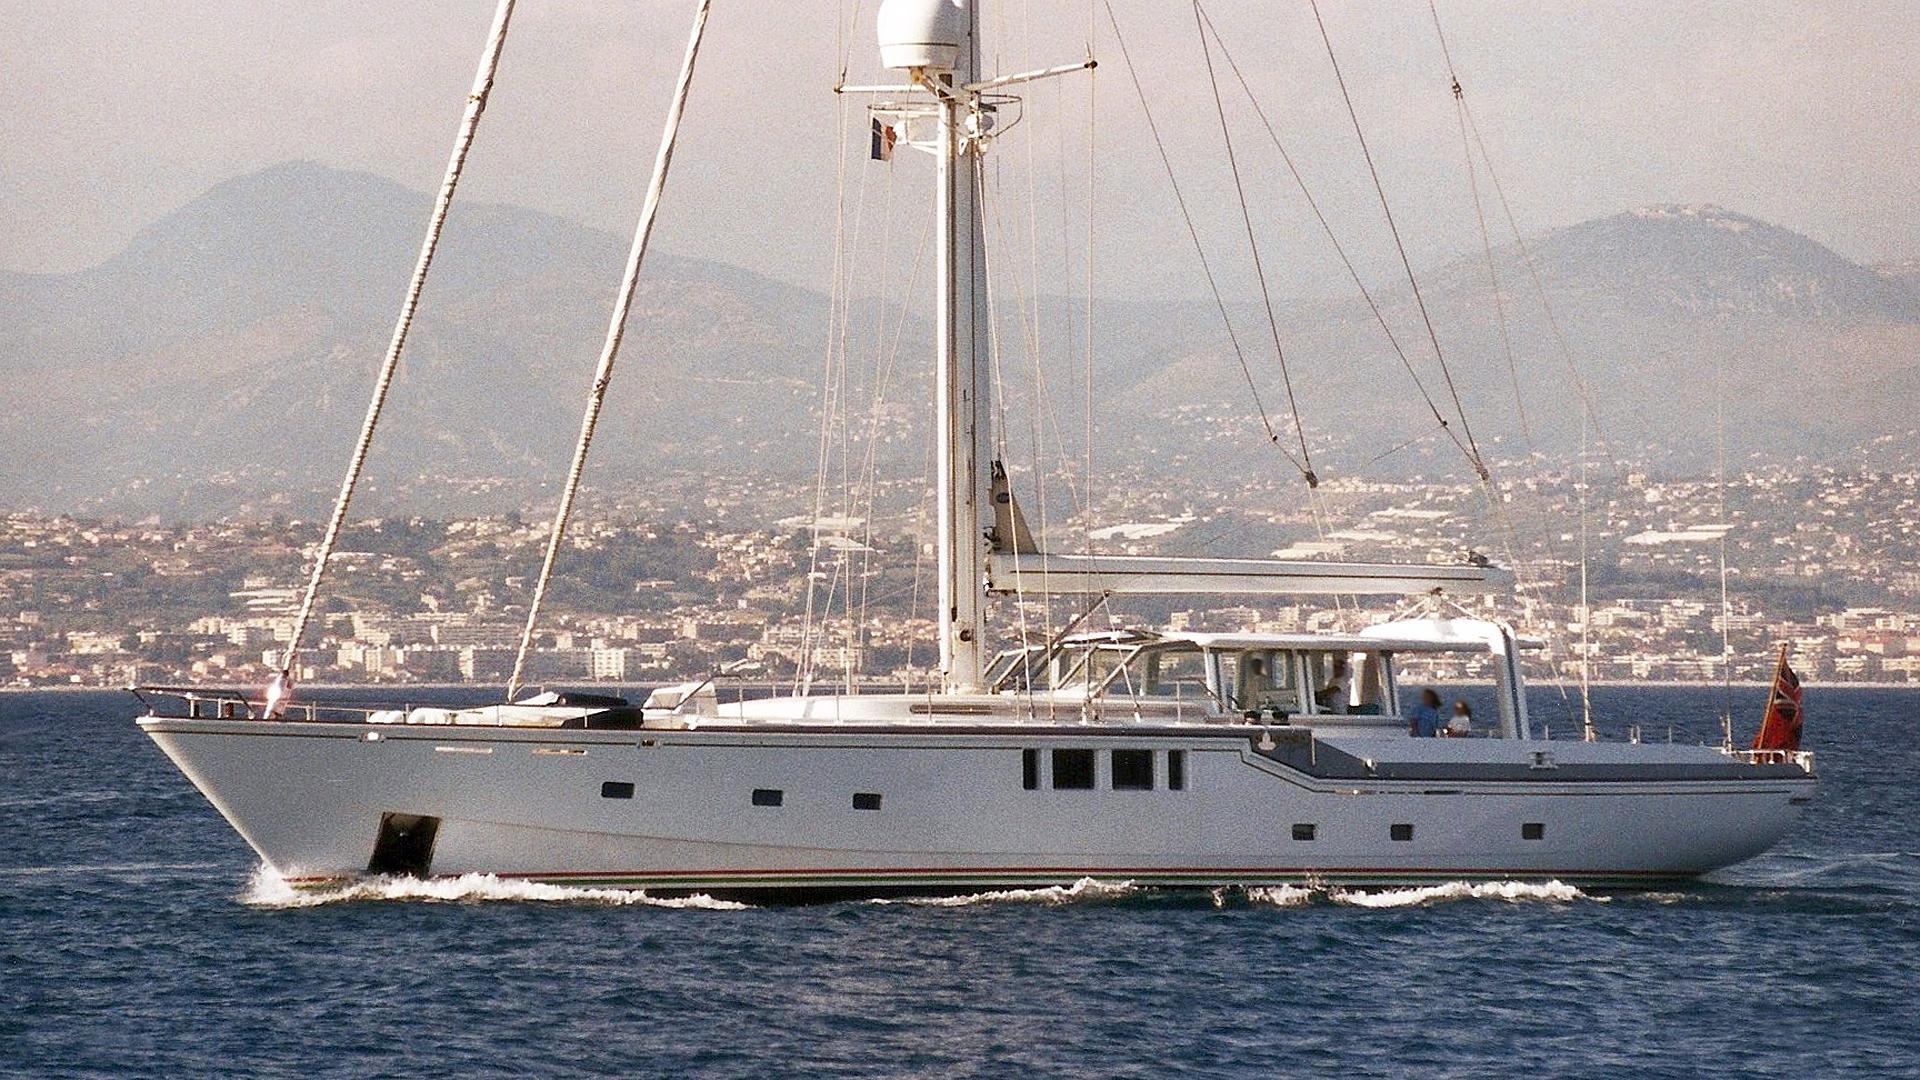 diamonds-for-ever-sailing-yacht-royal-huisman-1987-36m-profile